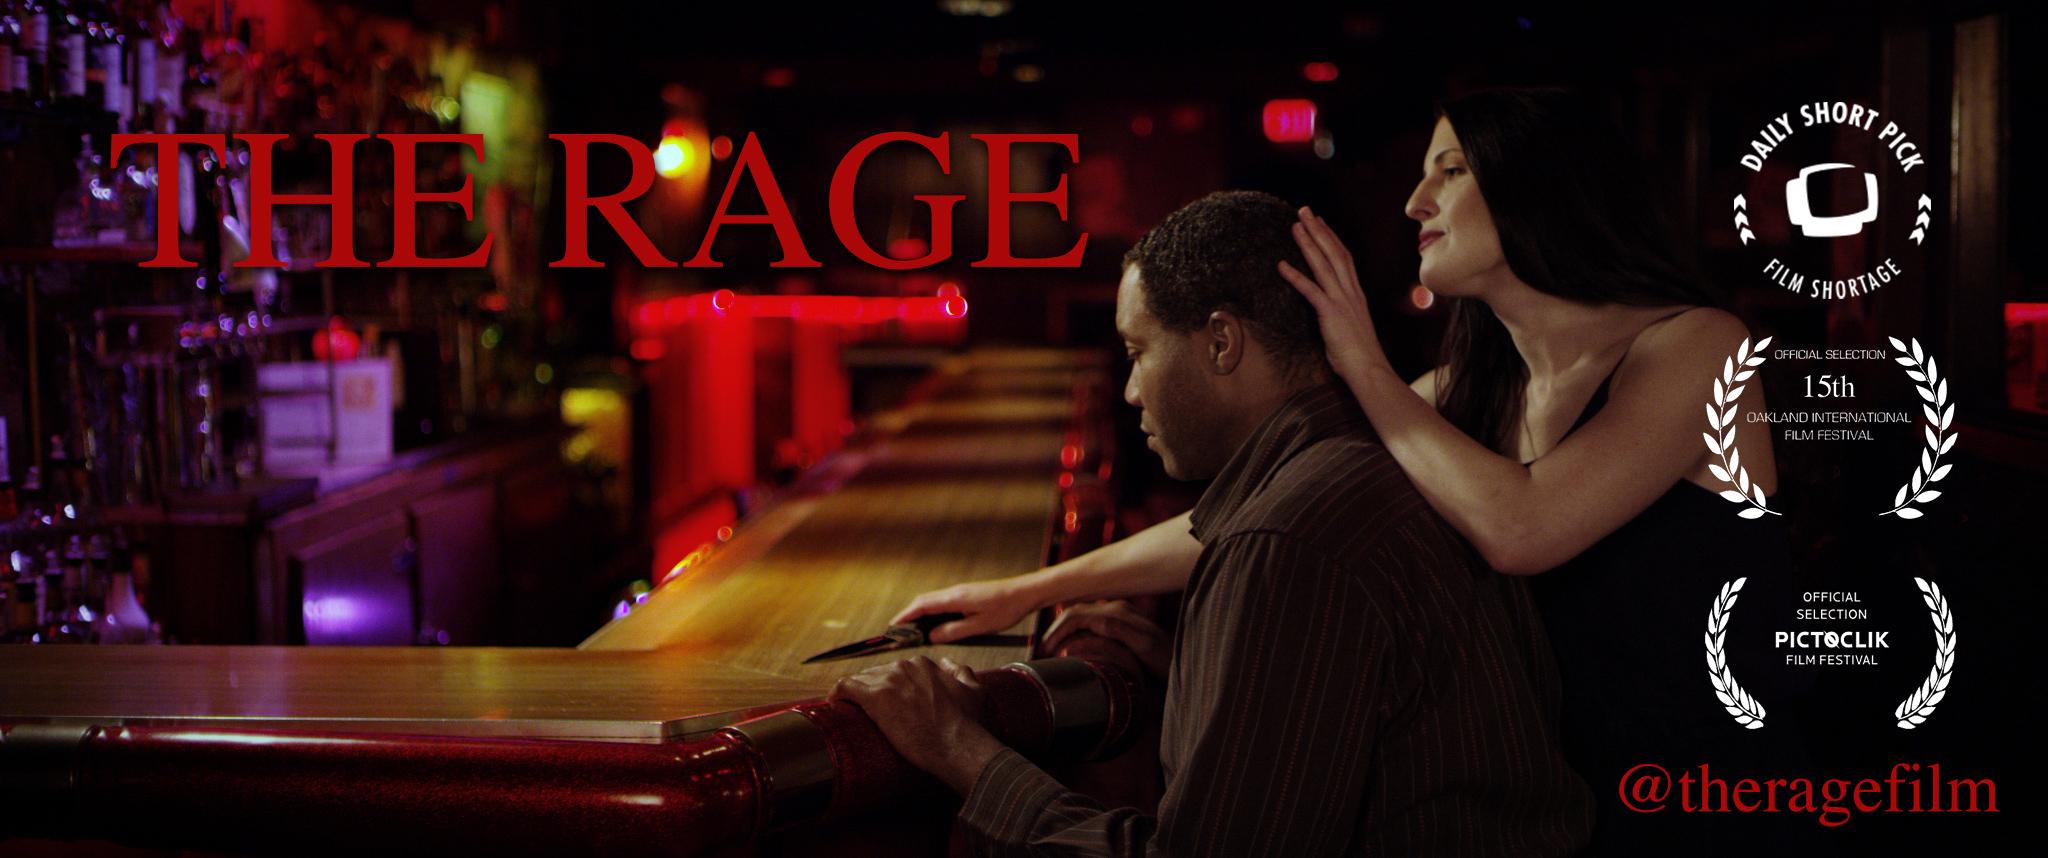 The_Rage_Hero_Image_2.jpg